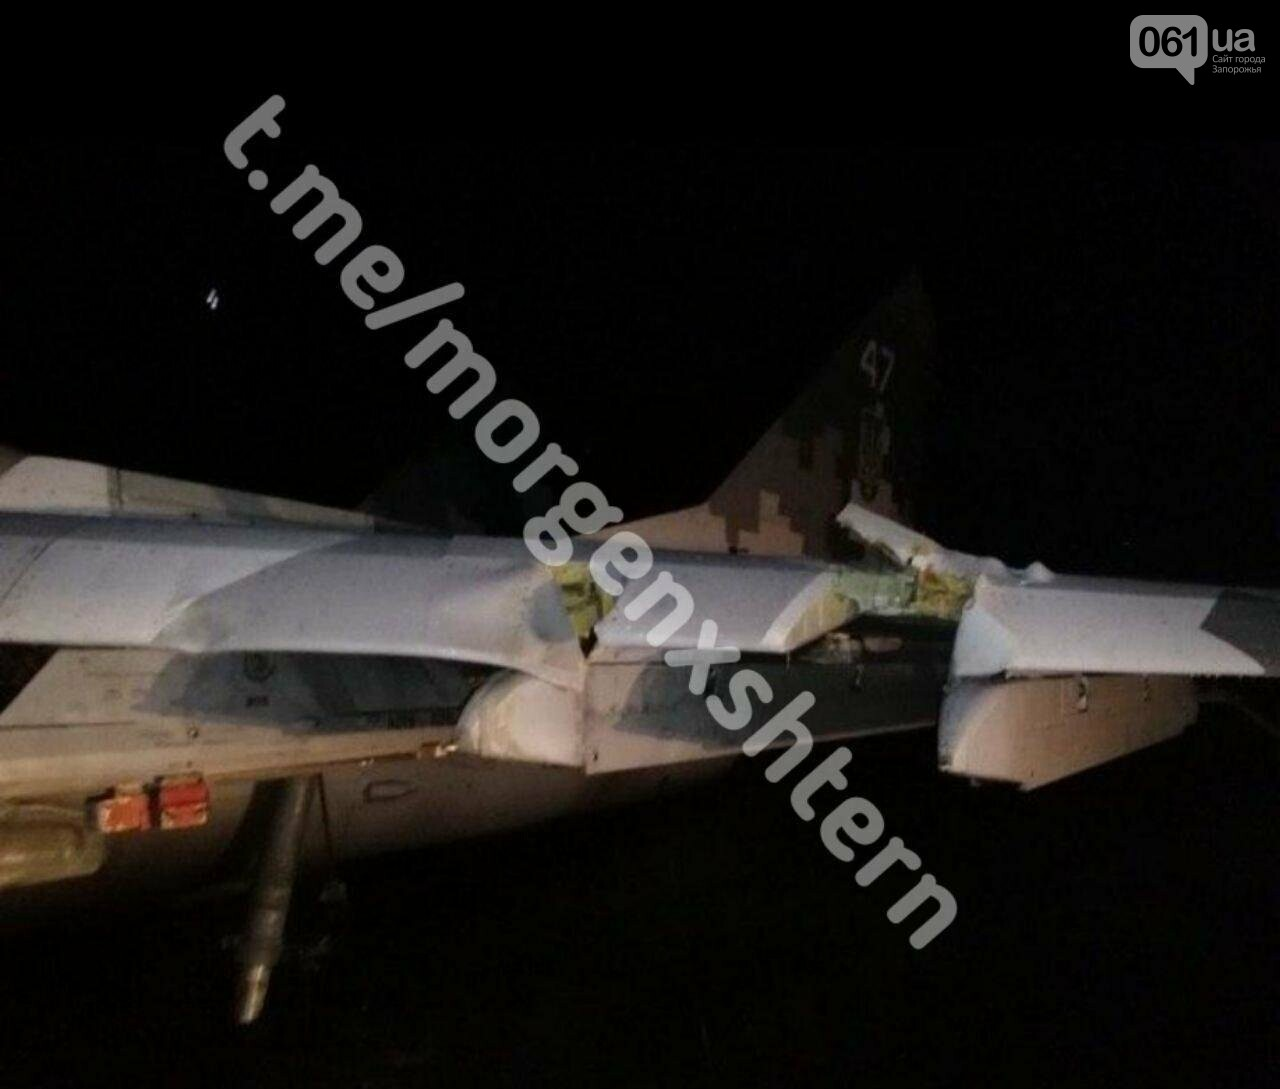 На аэродроме в Мелитополе совершил аварийную посадку истребитель МИГ-29, фото-2